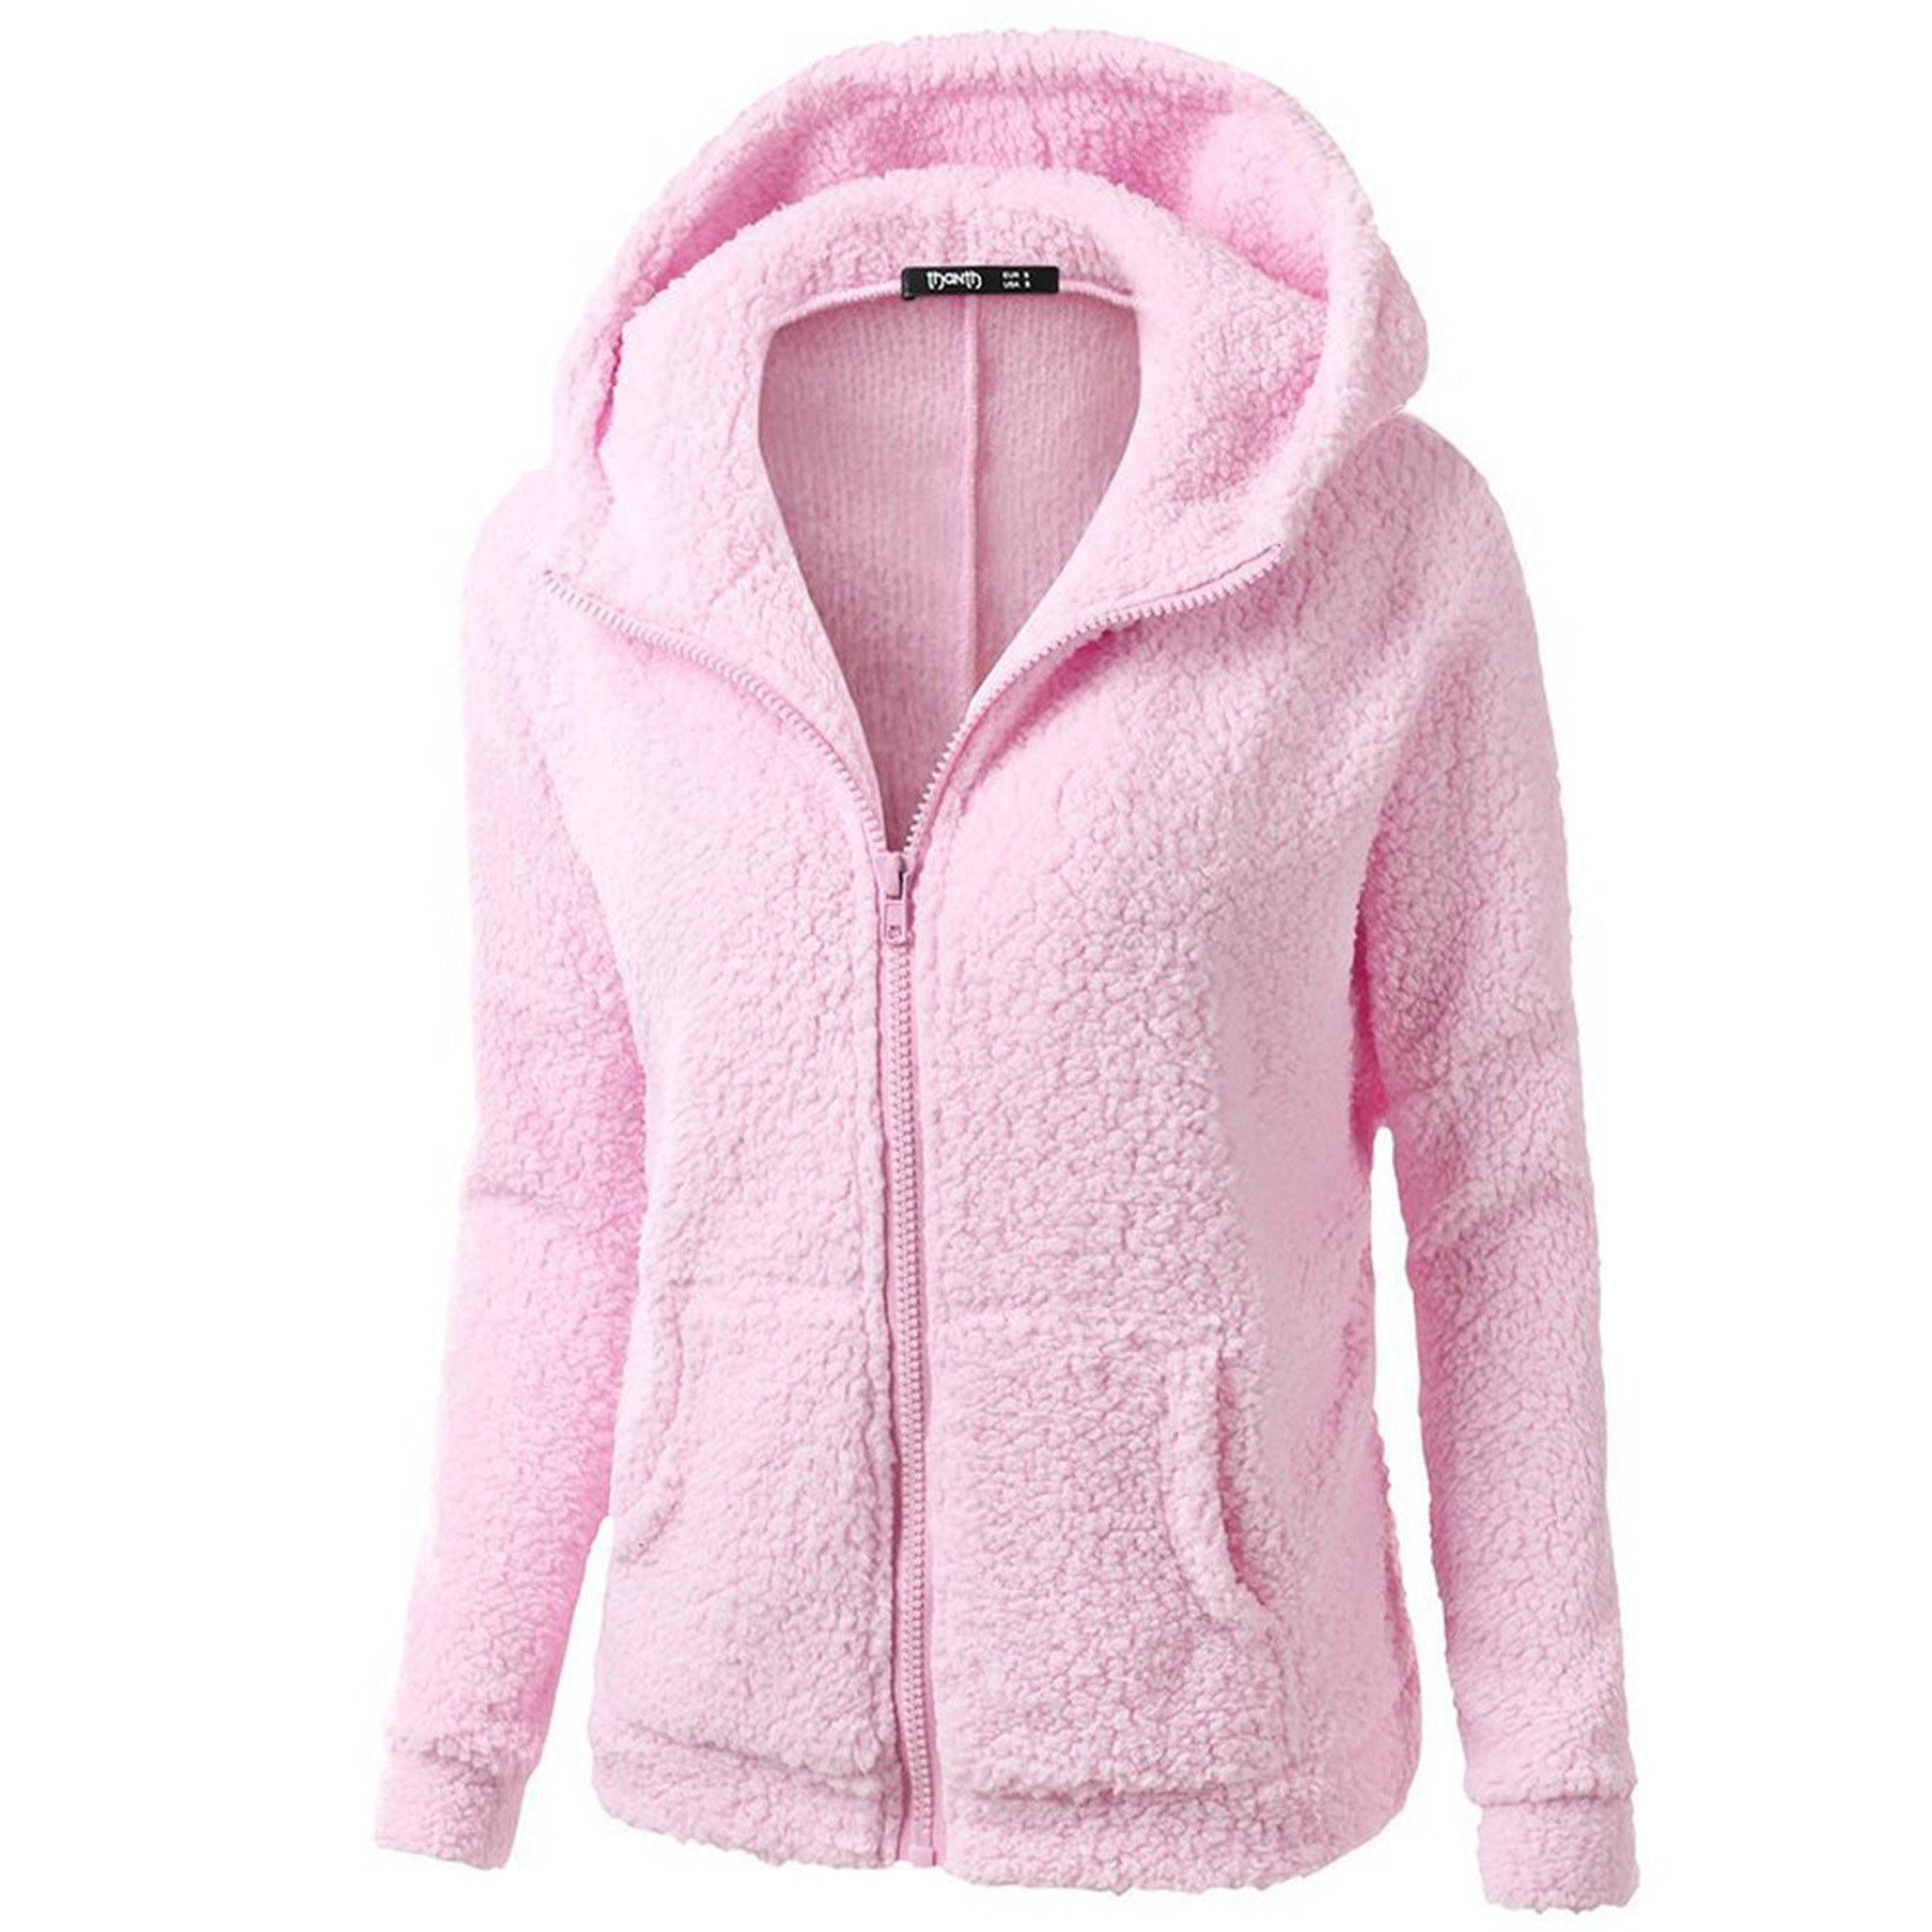 Clearance! sfe Women Winter Faux Fur Hoodie Cotton Jacket Fashion Solid Color Warm Coat Down Jacket (Pink, L)